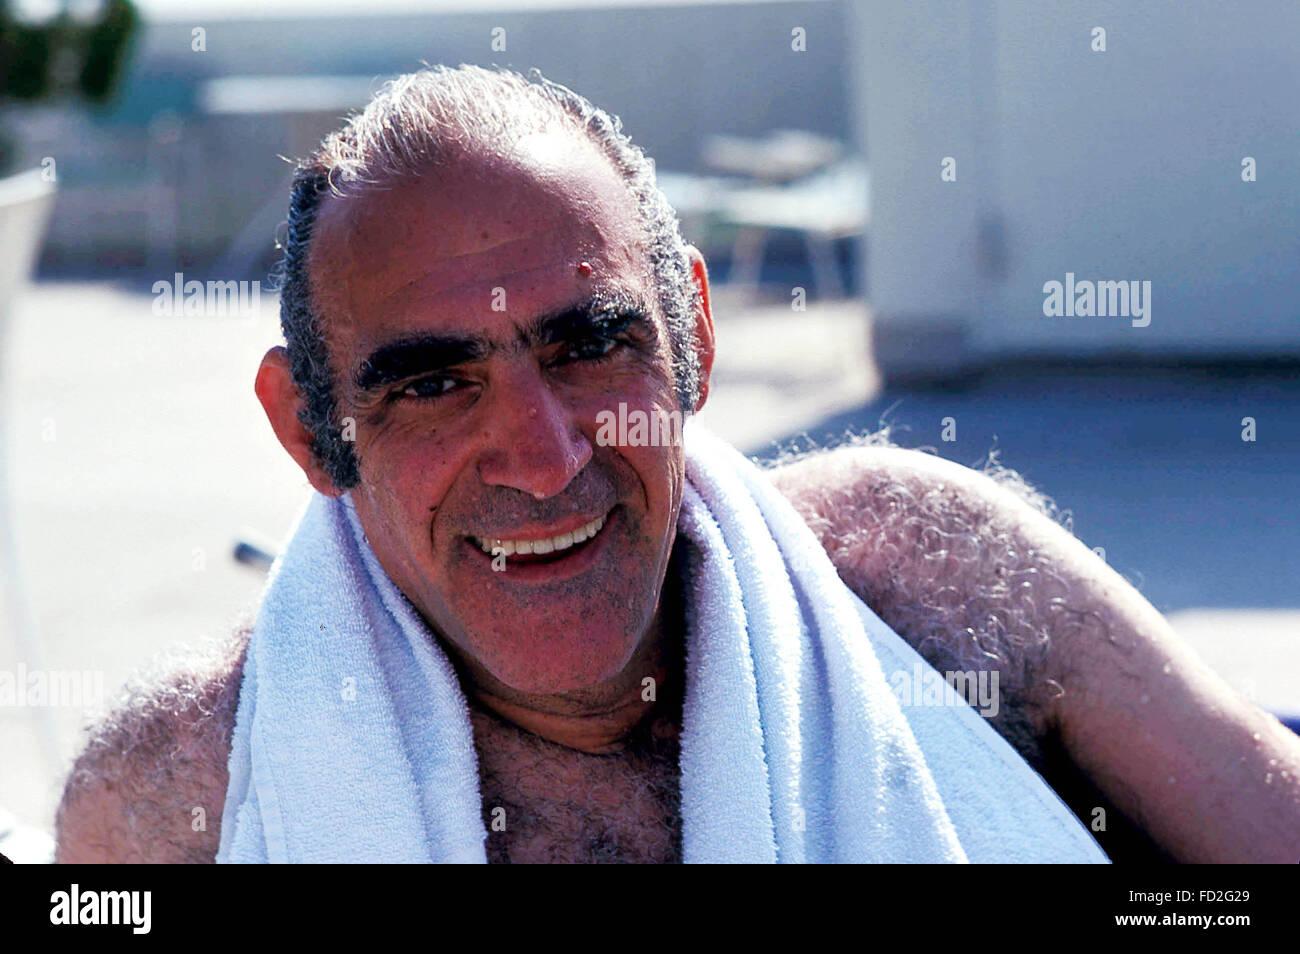 Actor ABE VIGODA Who Played The Decrepit Detective Phil Fish In Television Sitcom Barney Miller And Mafia Lieutenant Sal Tessio Original